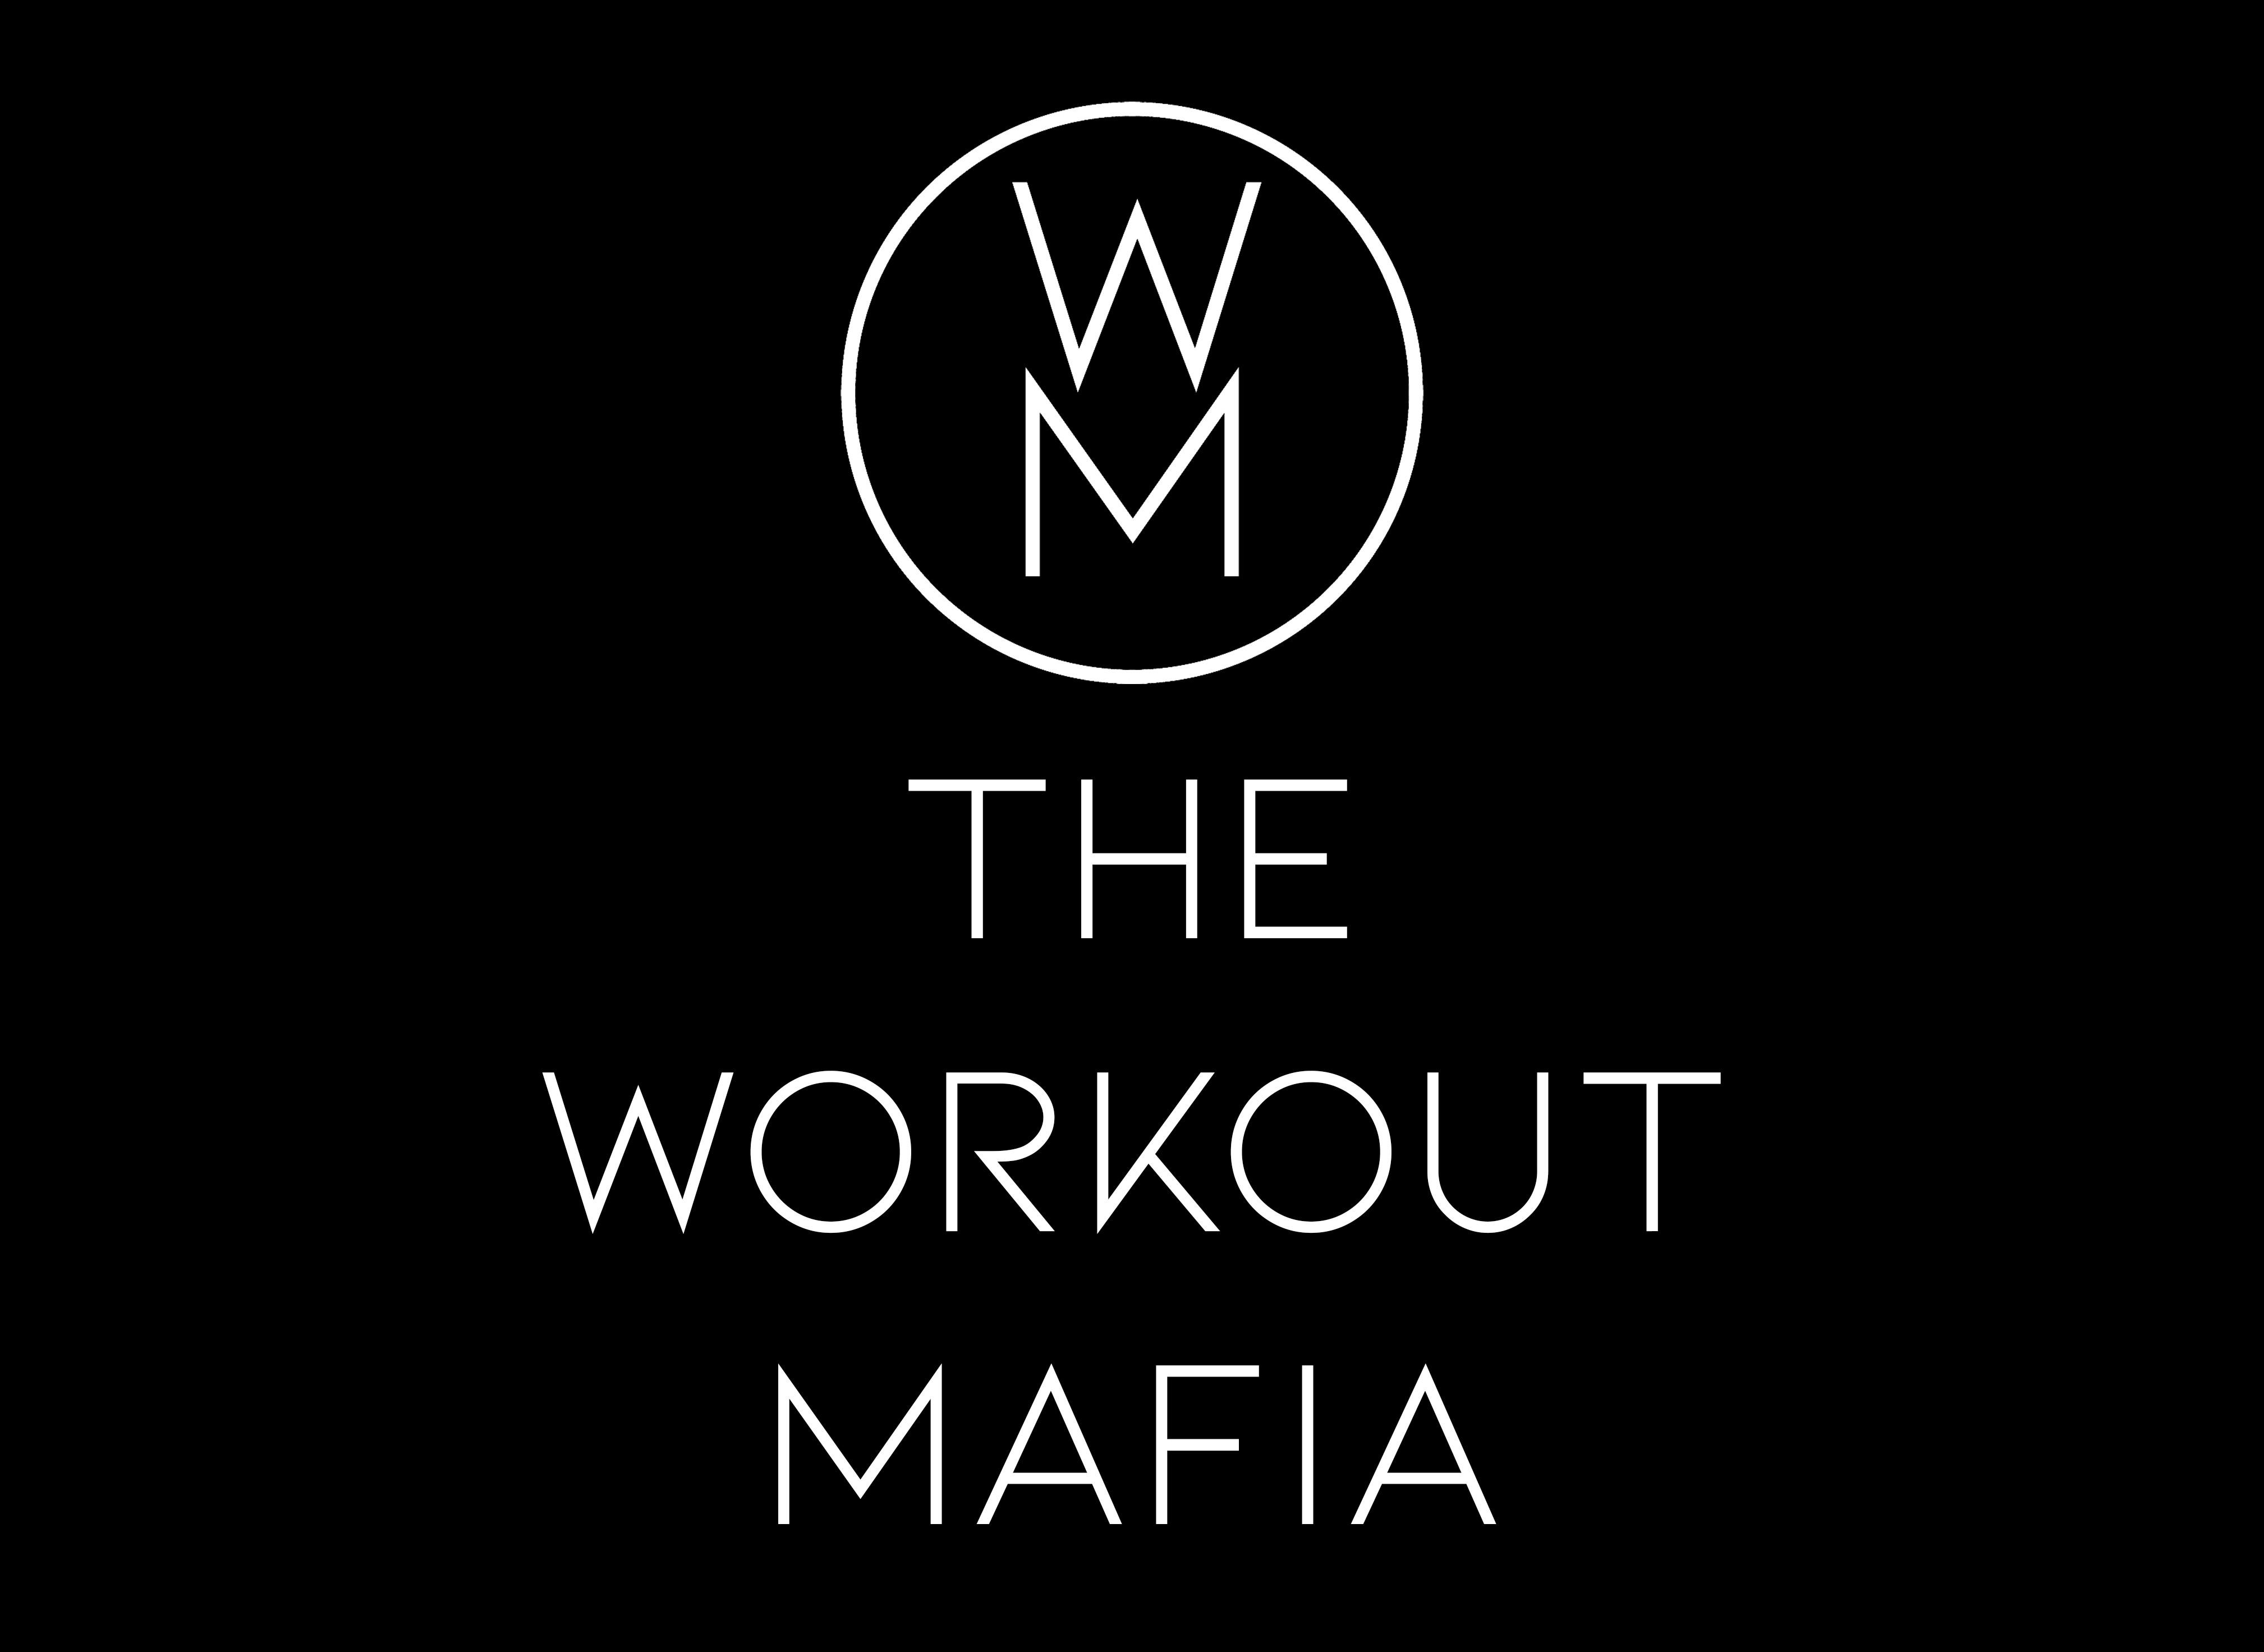 THE WORKOUT MAFIA